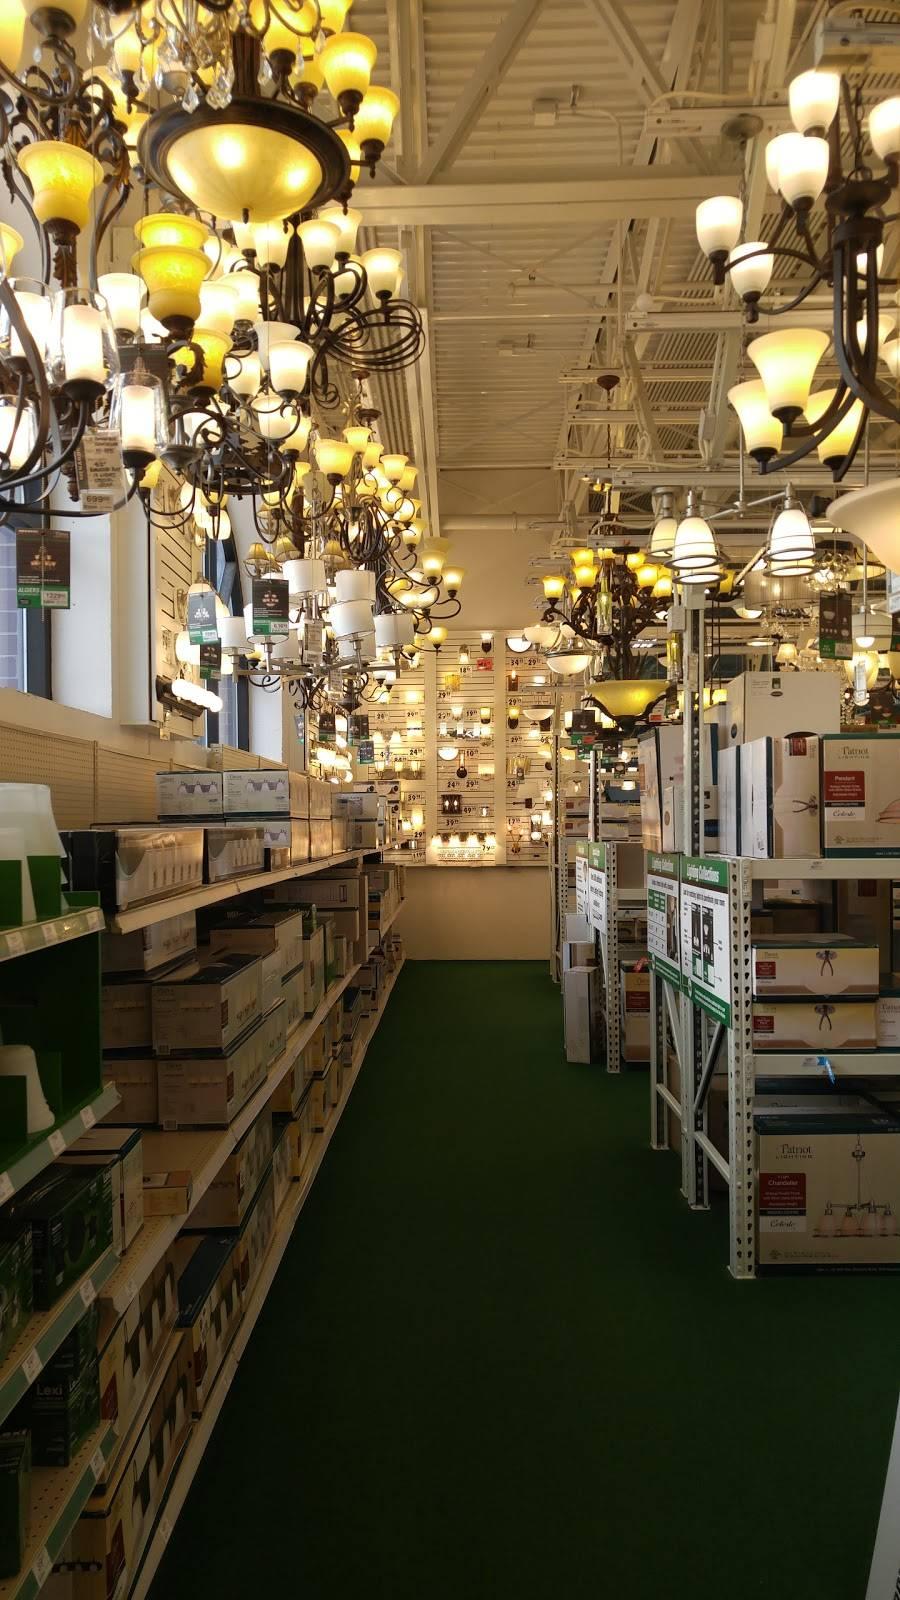 Menards - hardware store  | Photo 3 of 10 | Address: 7701 Nicollet Ave, Richfield, MN 55423, USA | Phone: (612) 798-0508